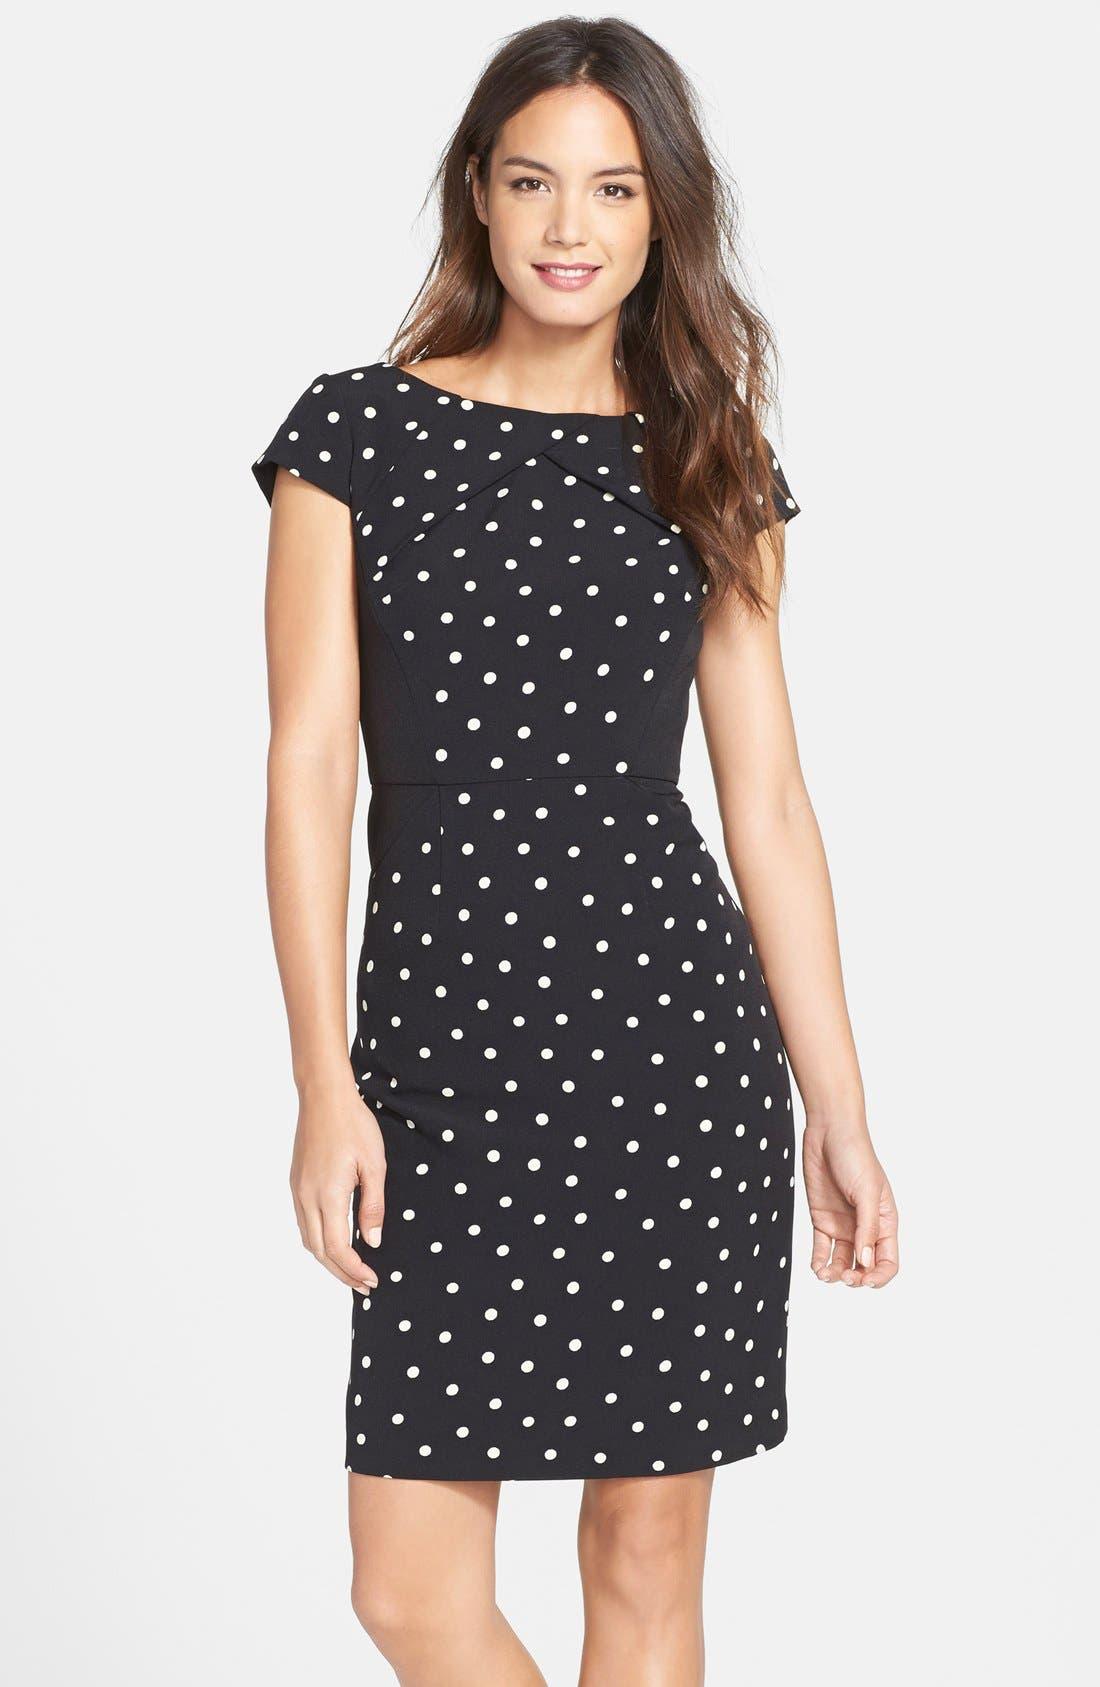 Alternate Image 1 Selected - Adrianna Papell Polka Dot Pleat Detail Sheath Dress